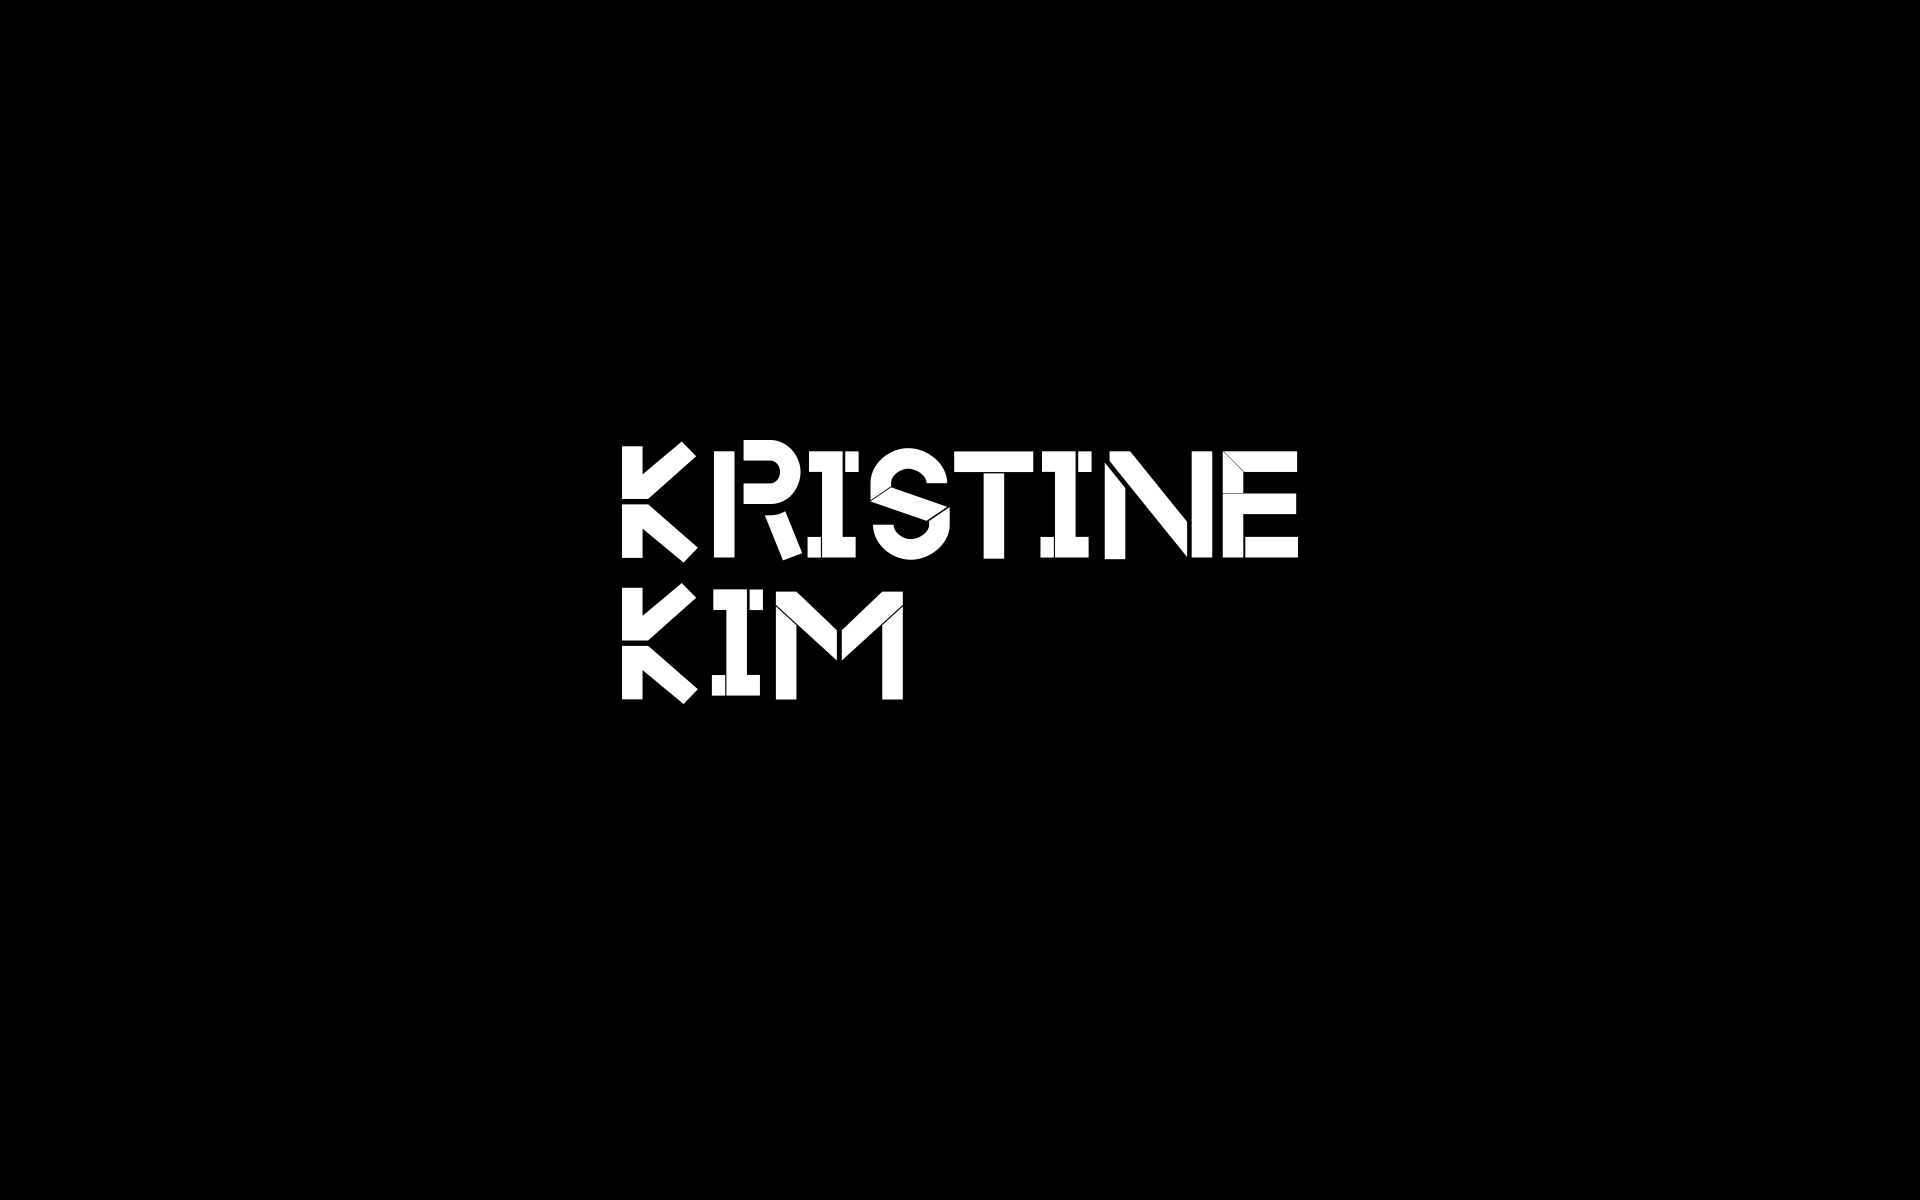 Kristine_v01Wordmark-02